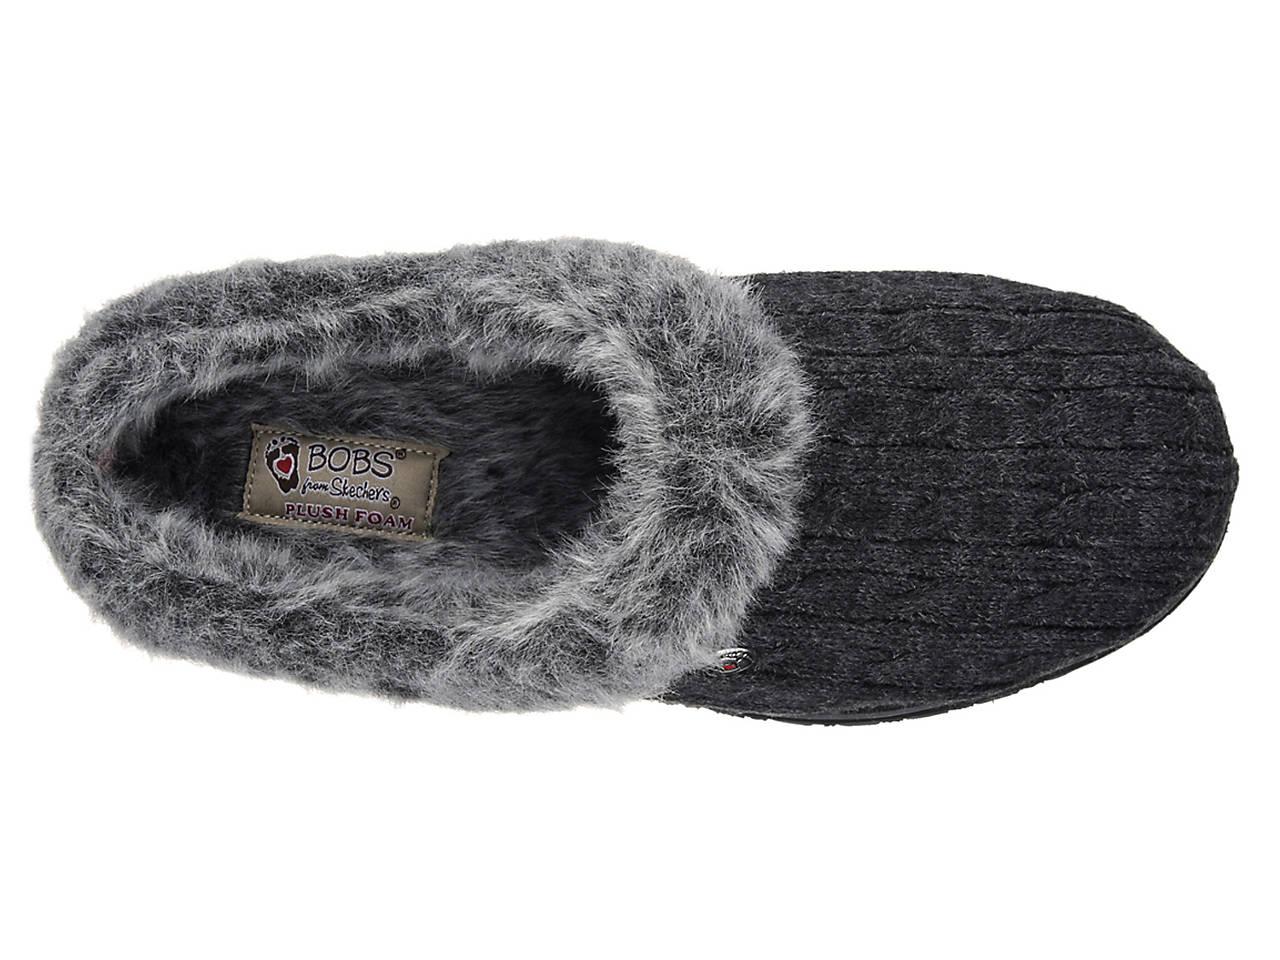 568a9ca8b6a2 BOBS from Skechers Keepsakes Ice Angel Slipper Women s Shoes